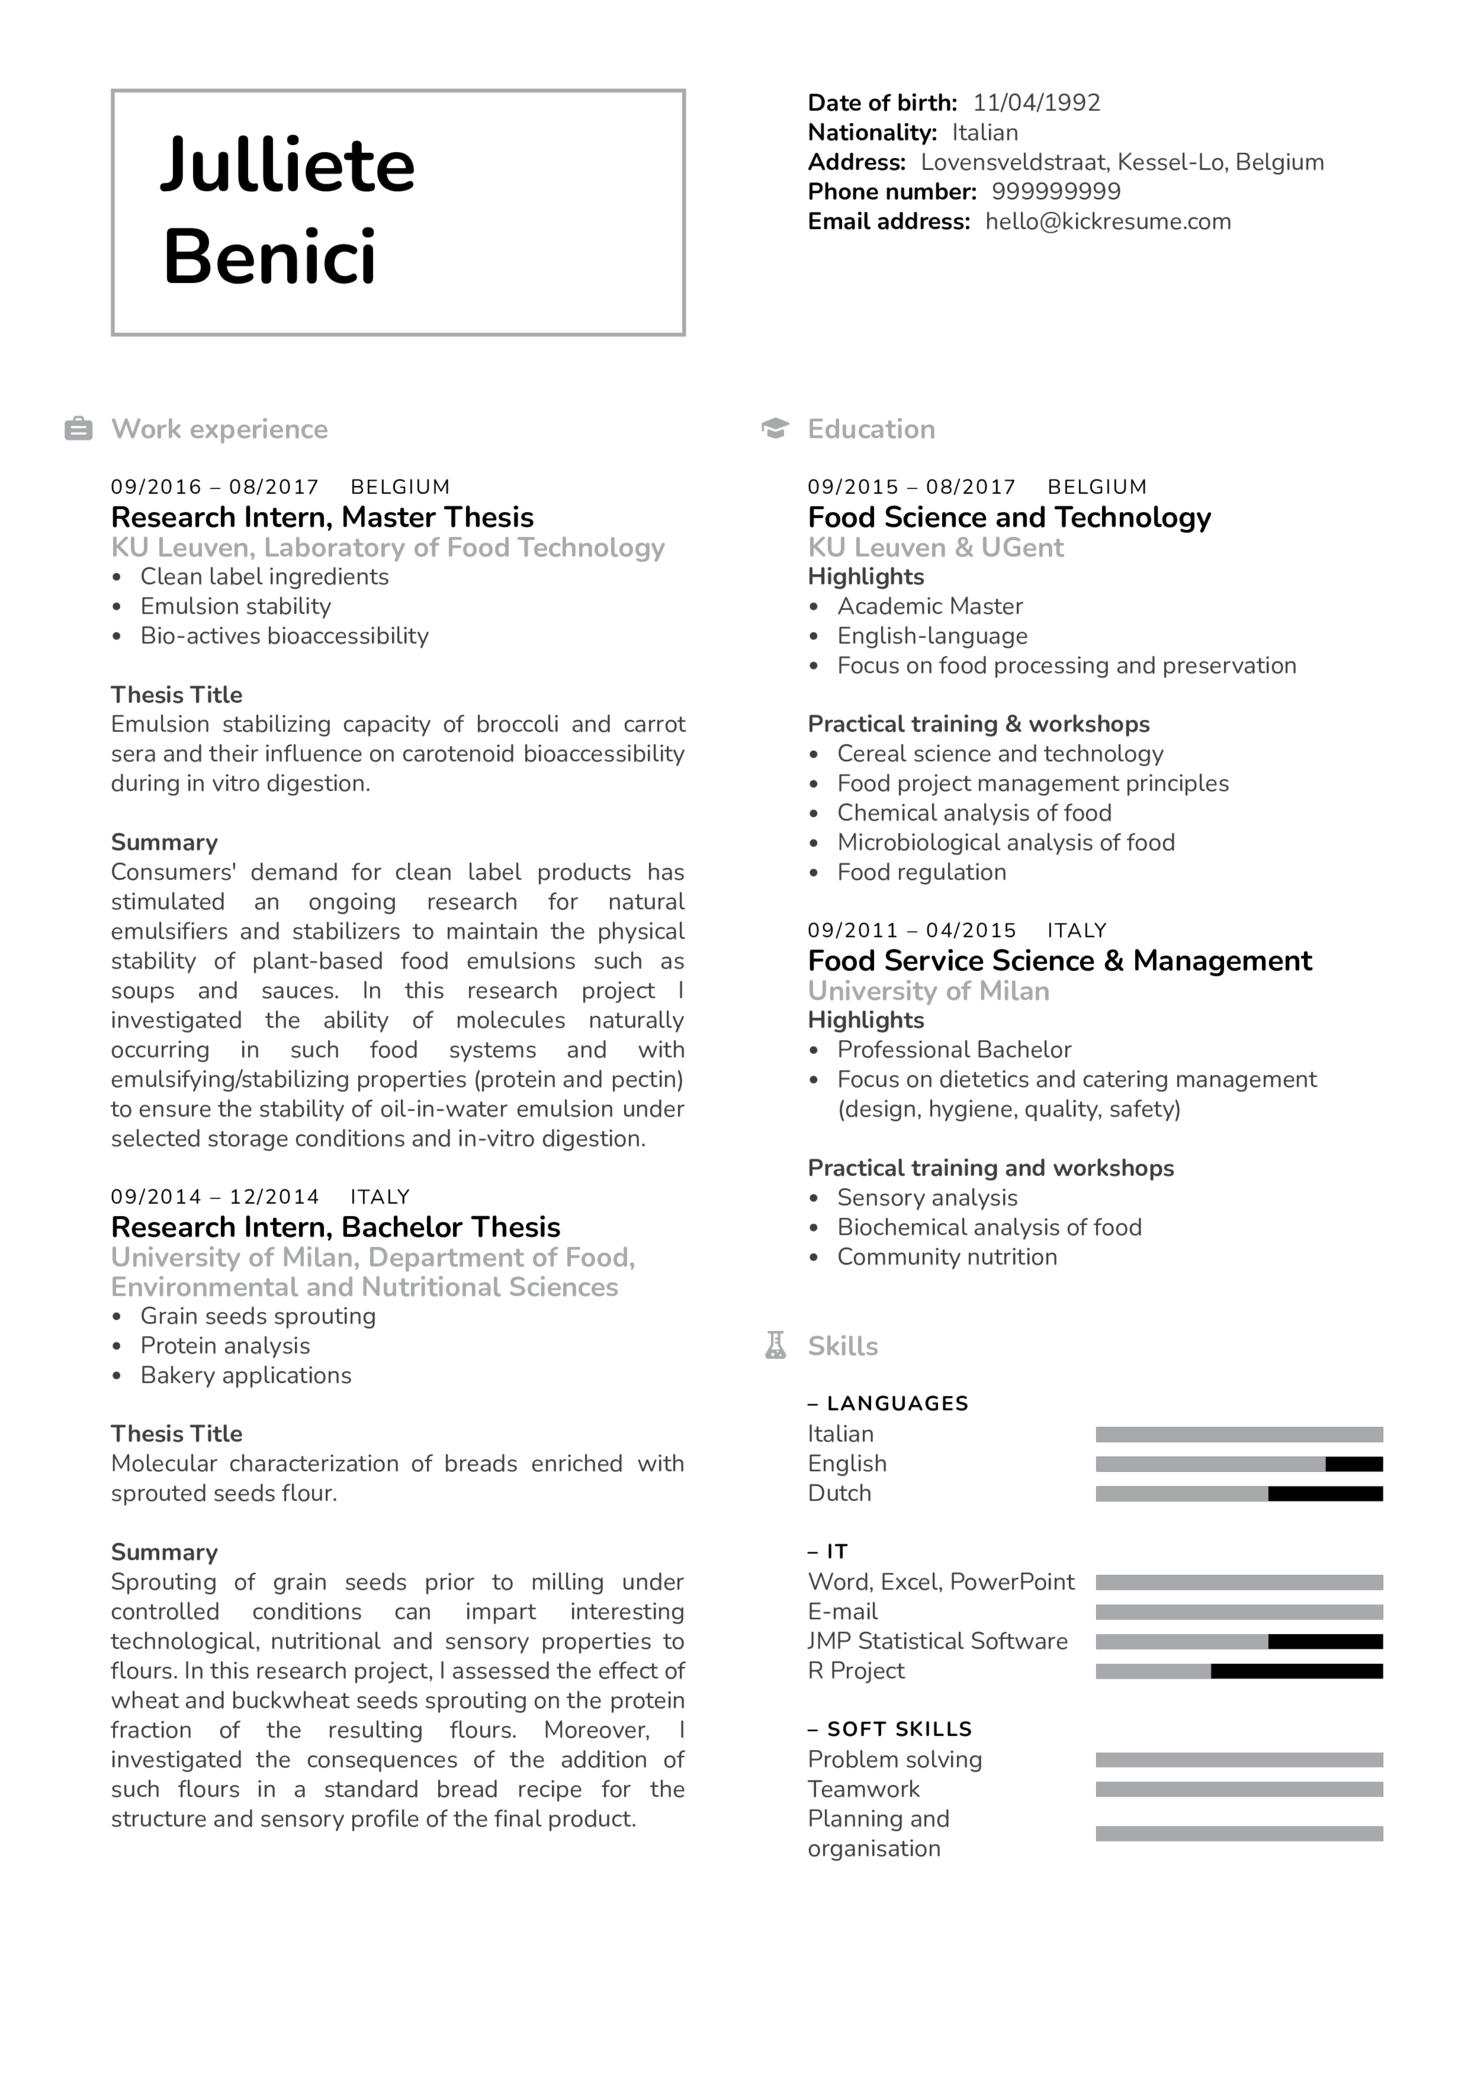 Quality Control Project Technician CV Example (časť 1)